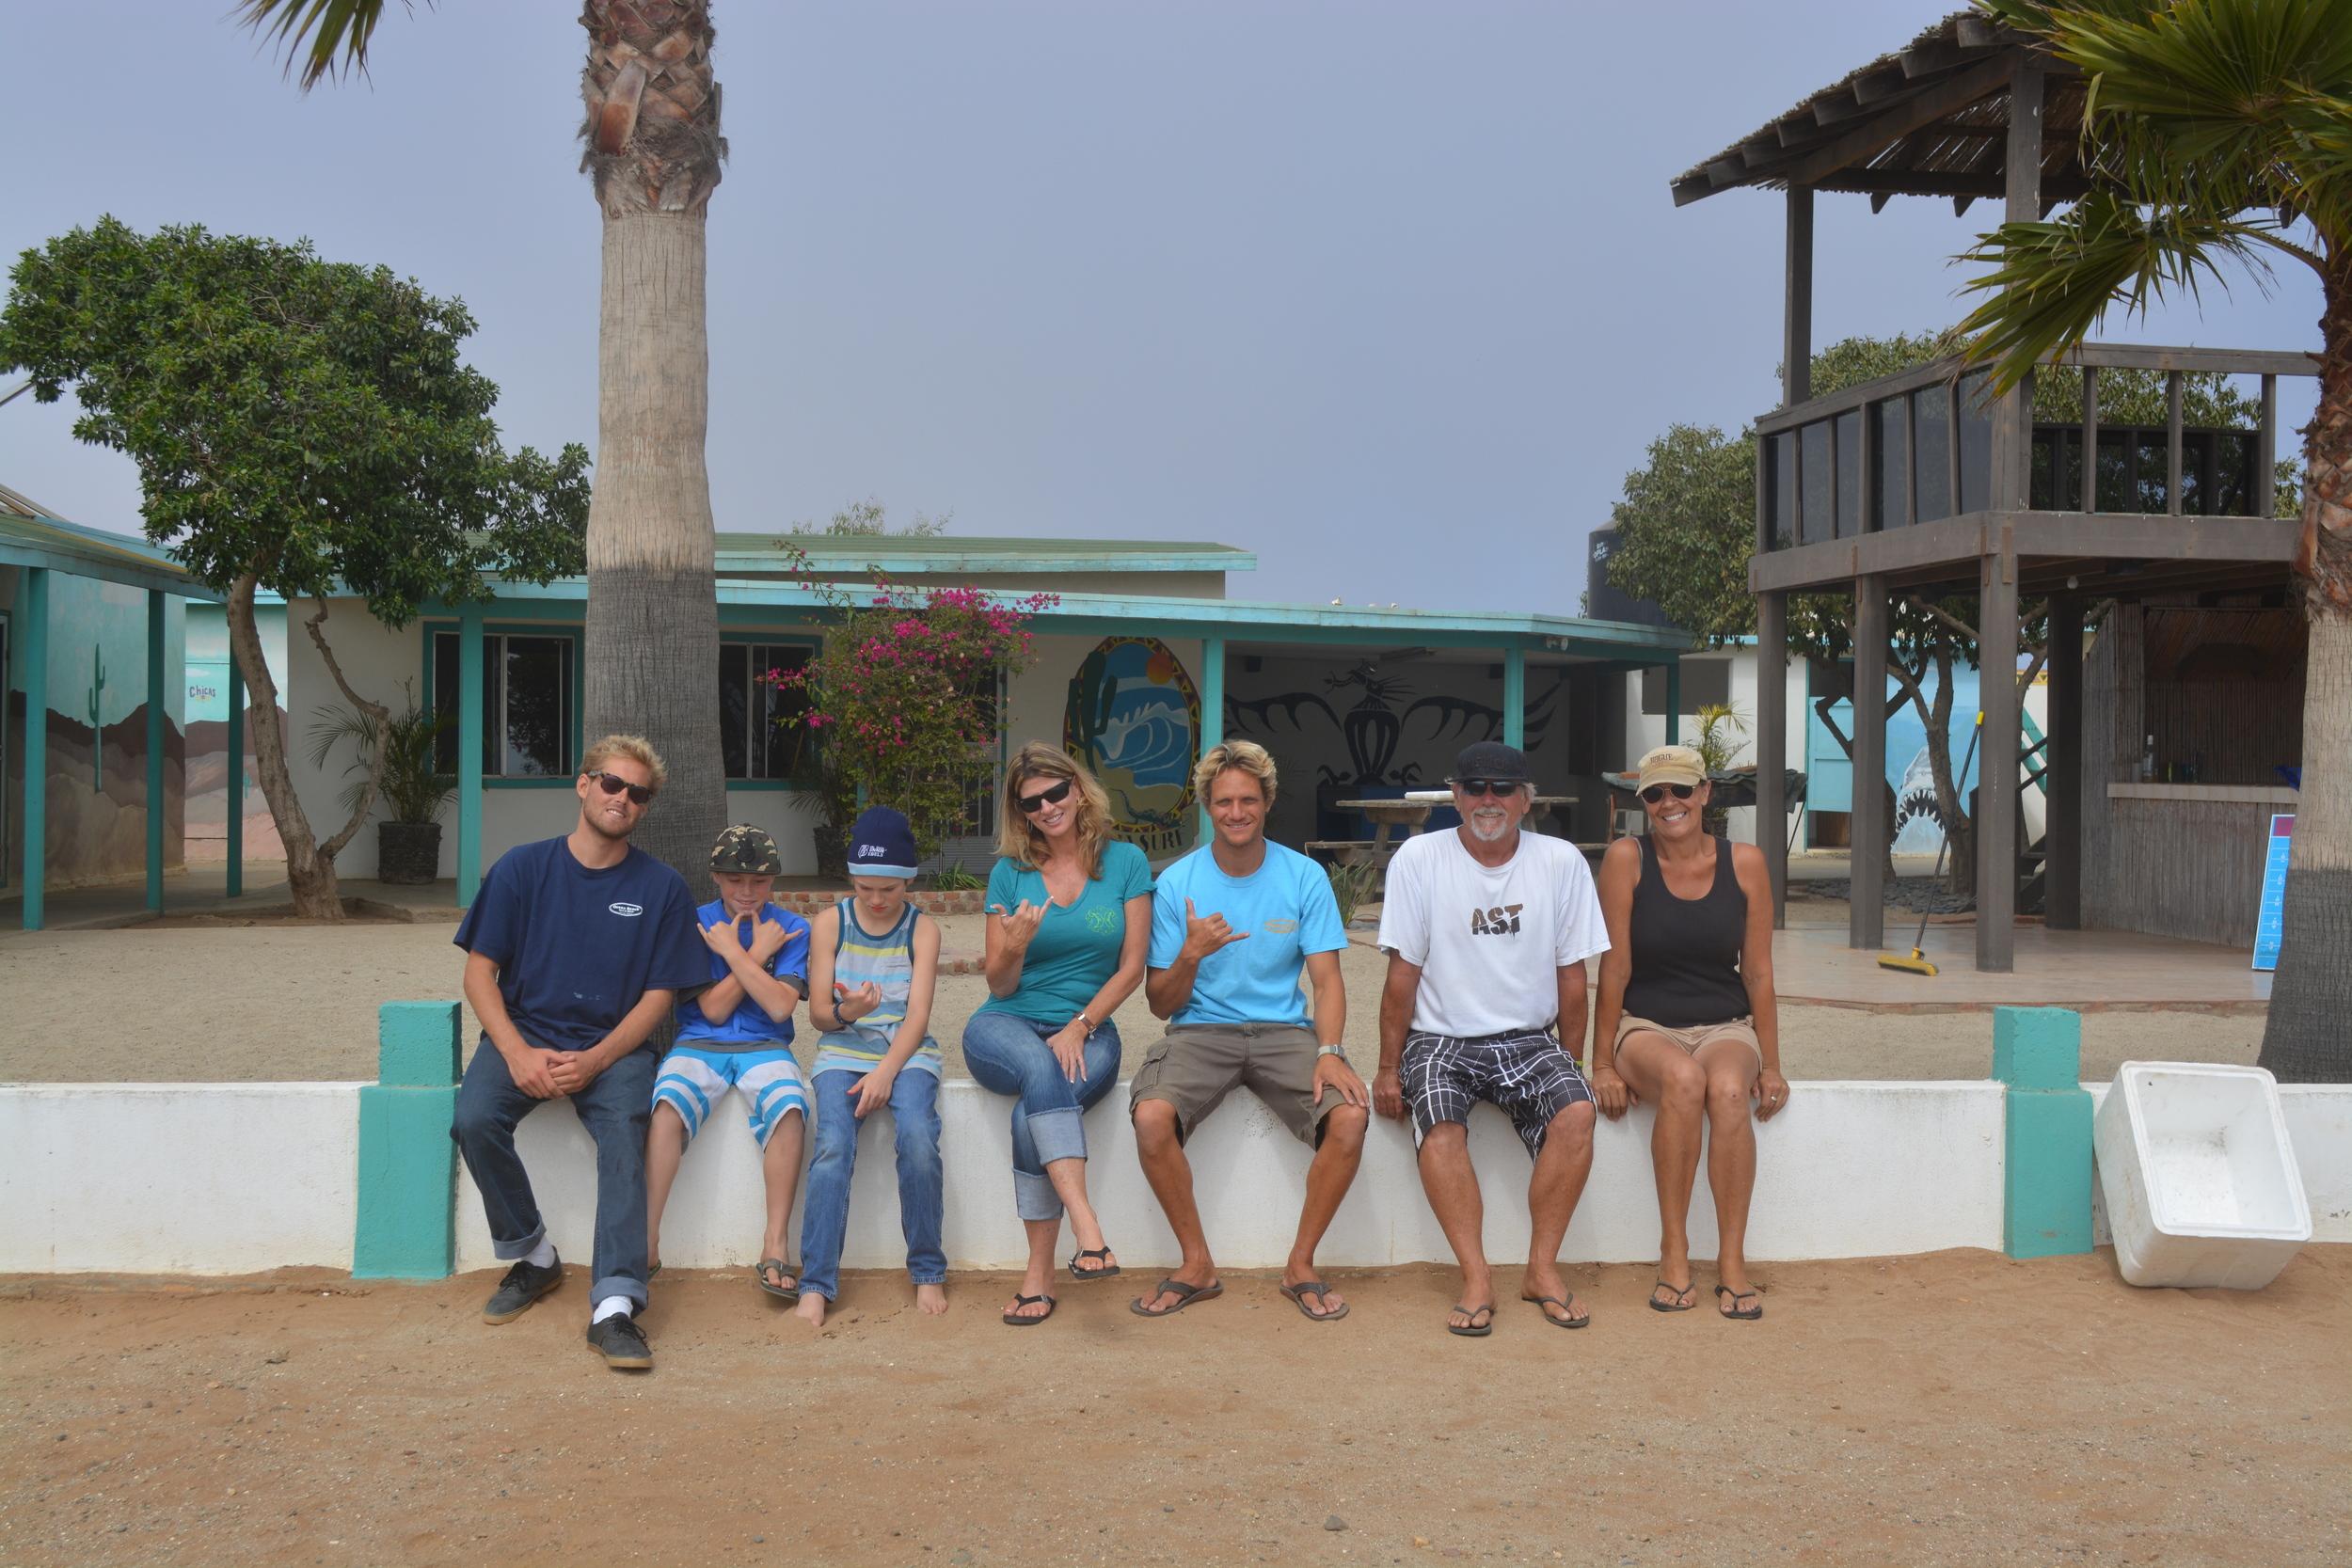 Baja California 10-5-13 Shipwrecks Surfing Adventure Ocean Experience Surf School San Diego (41).JPG